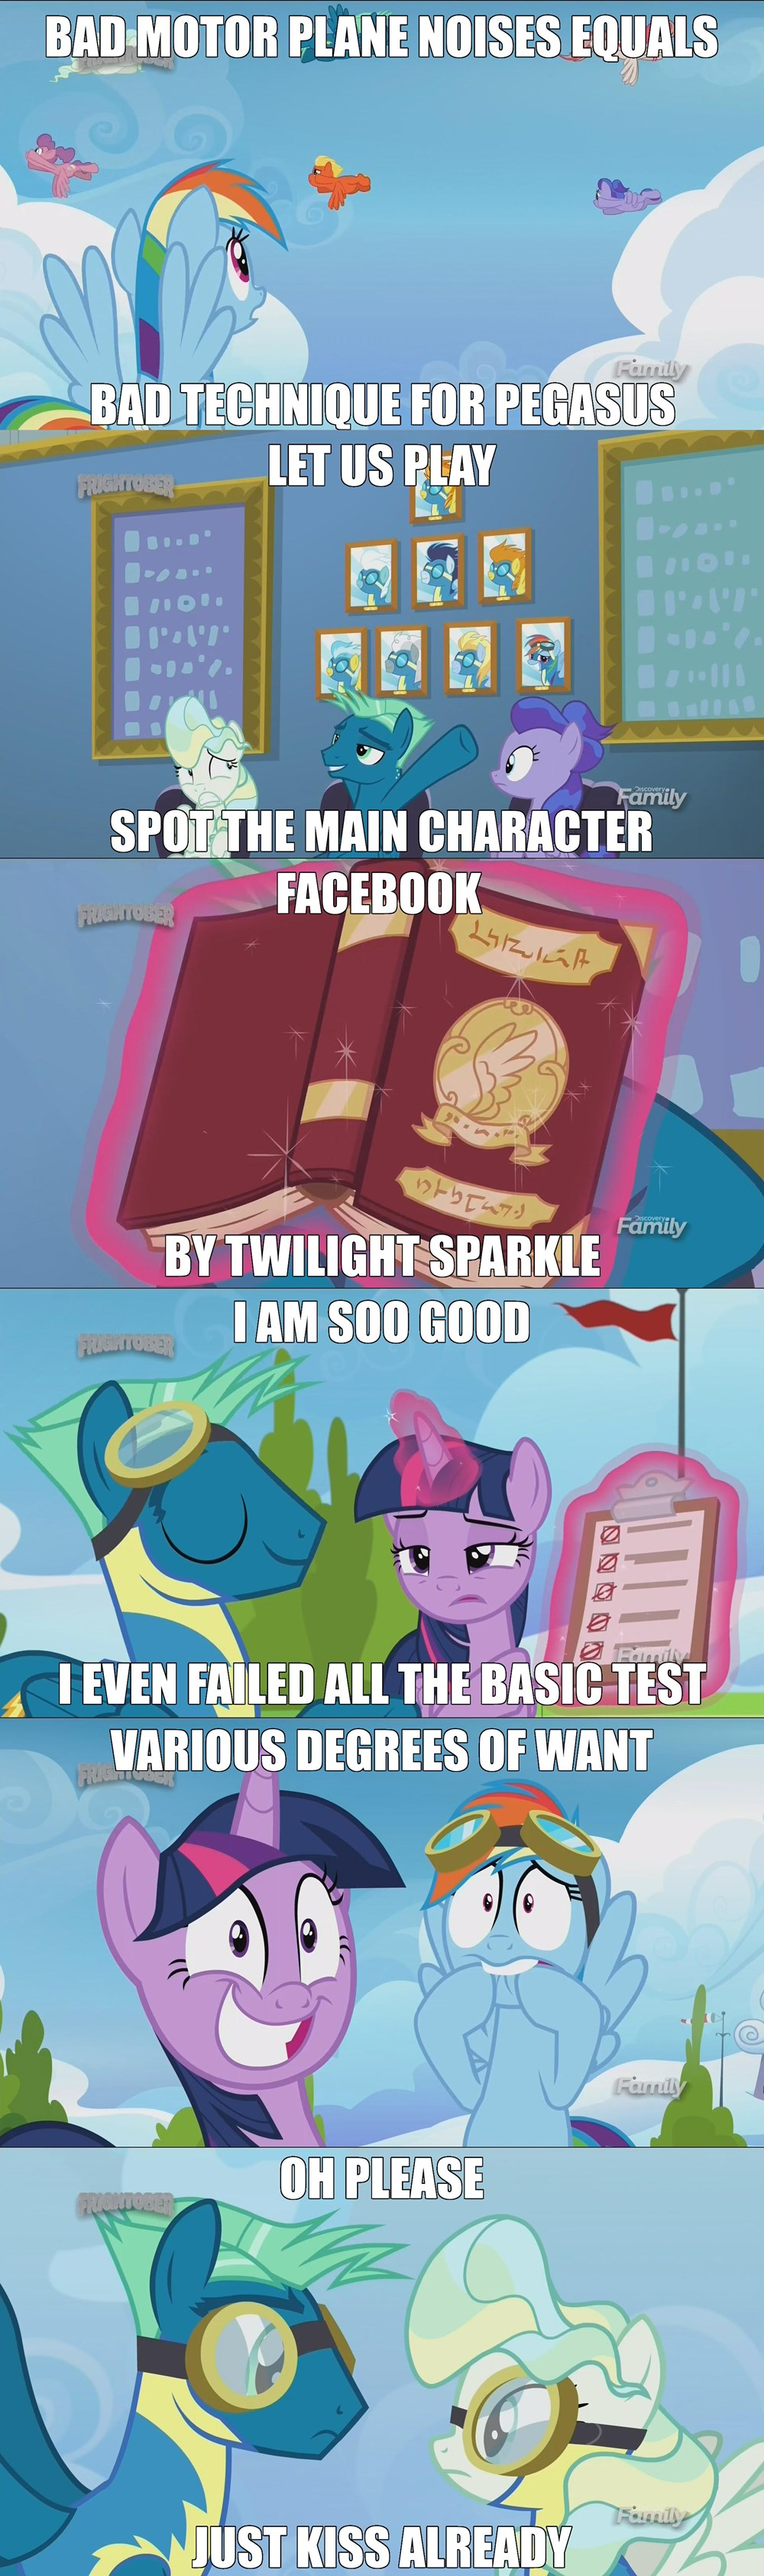 Top Meme - My Little Brony - my little pony, friendship is